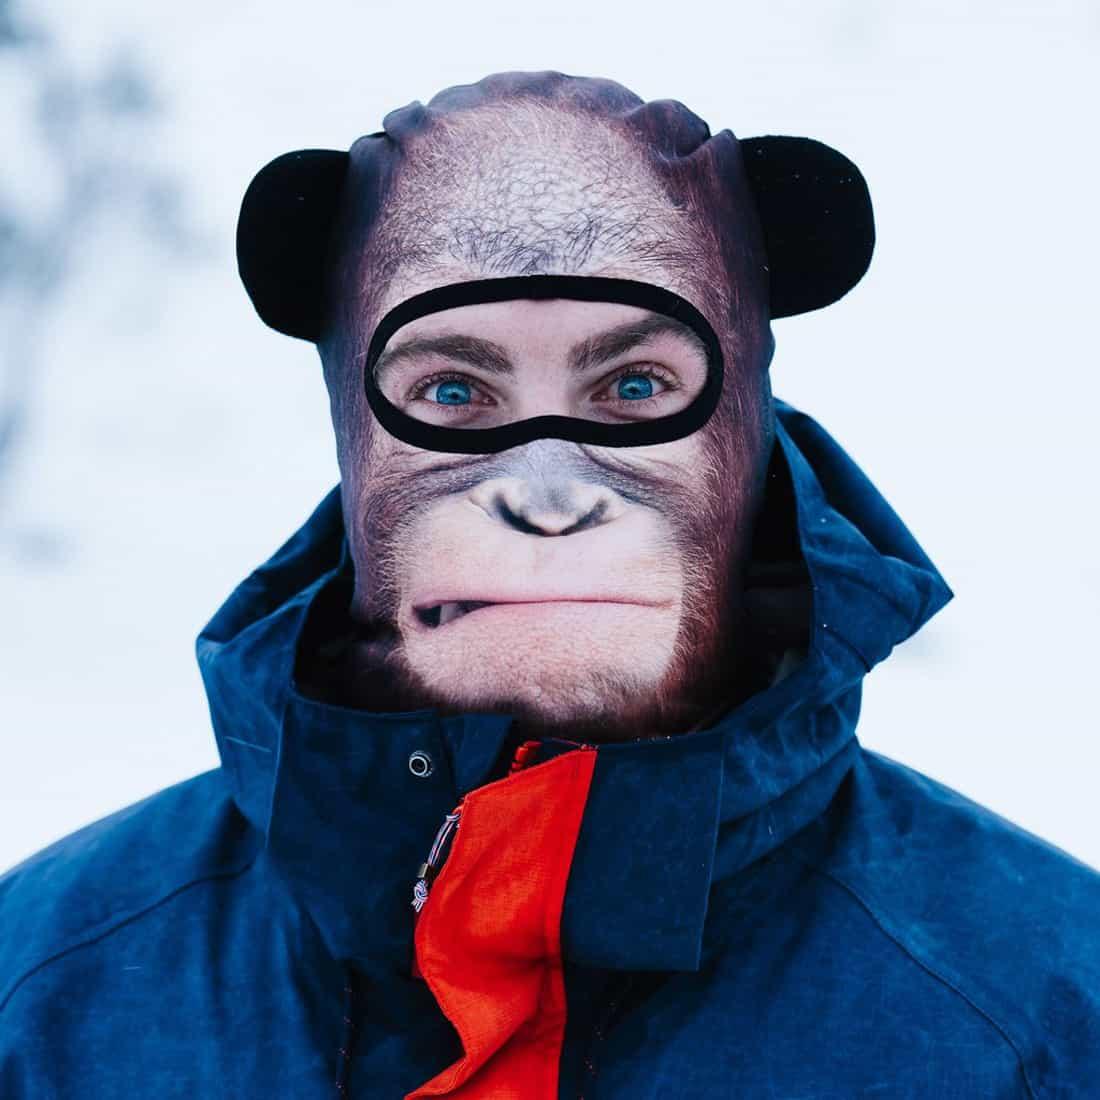 ultra realistic animal ski masks 12